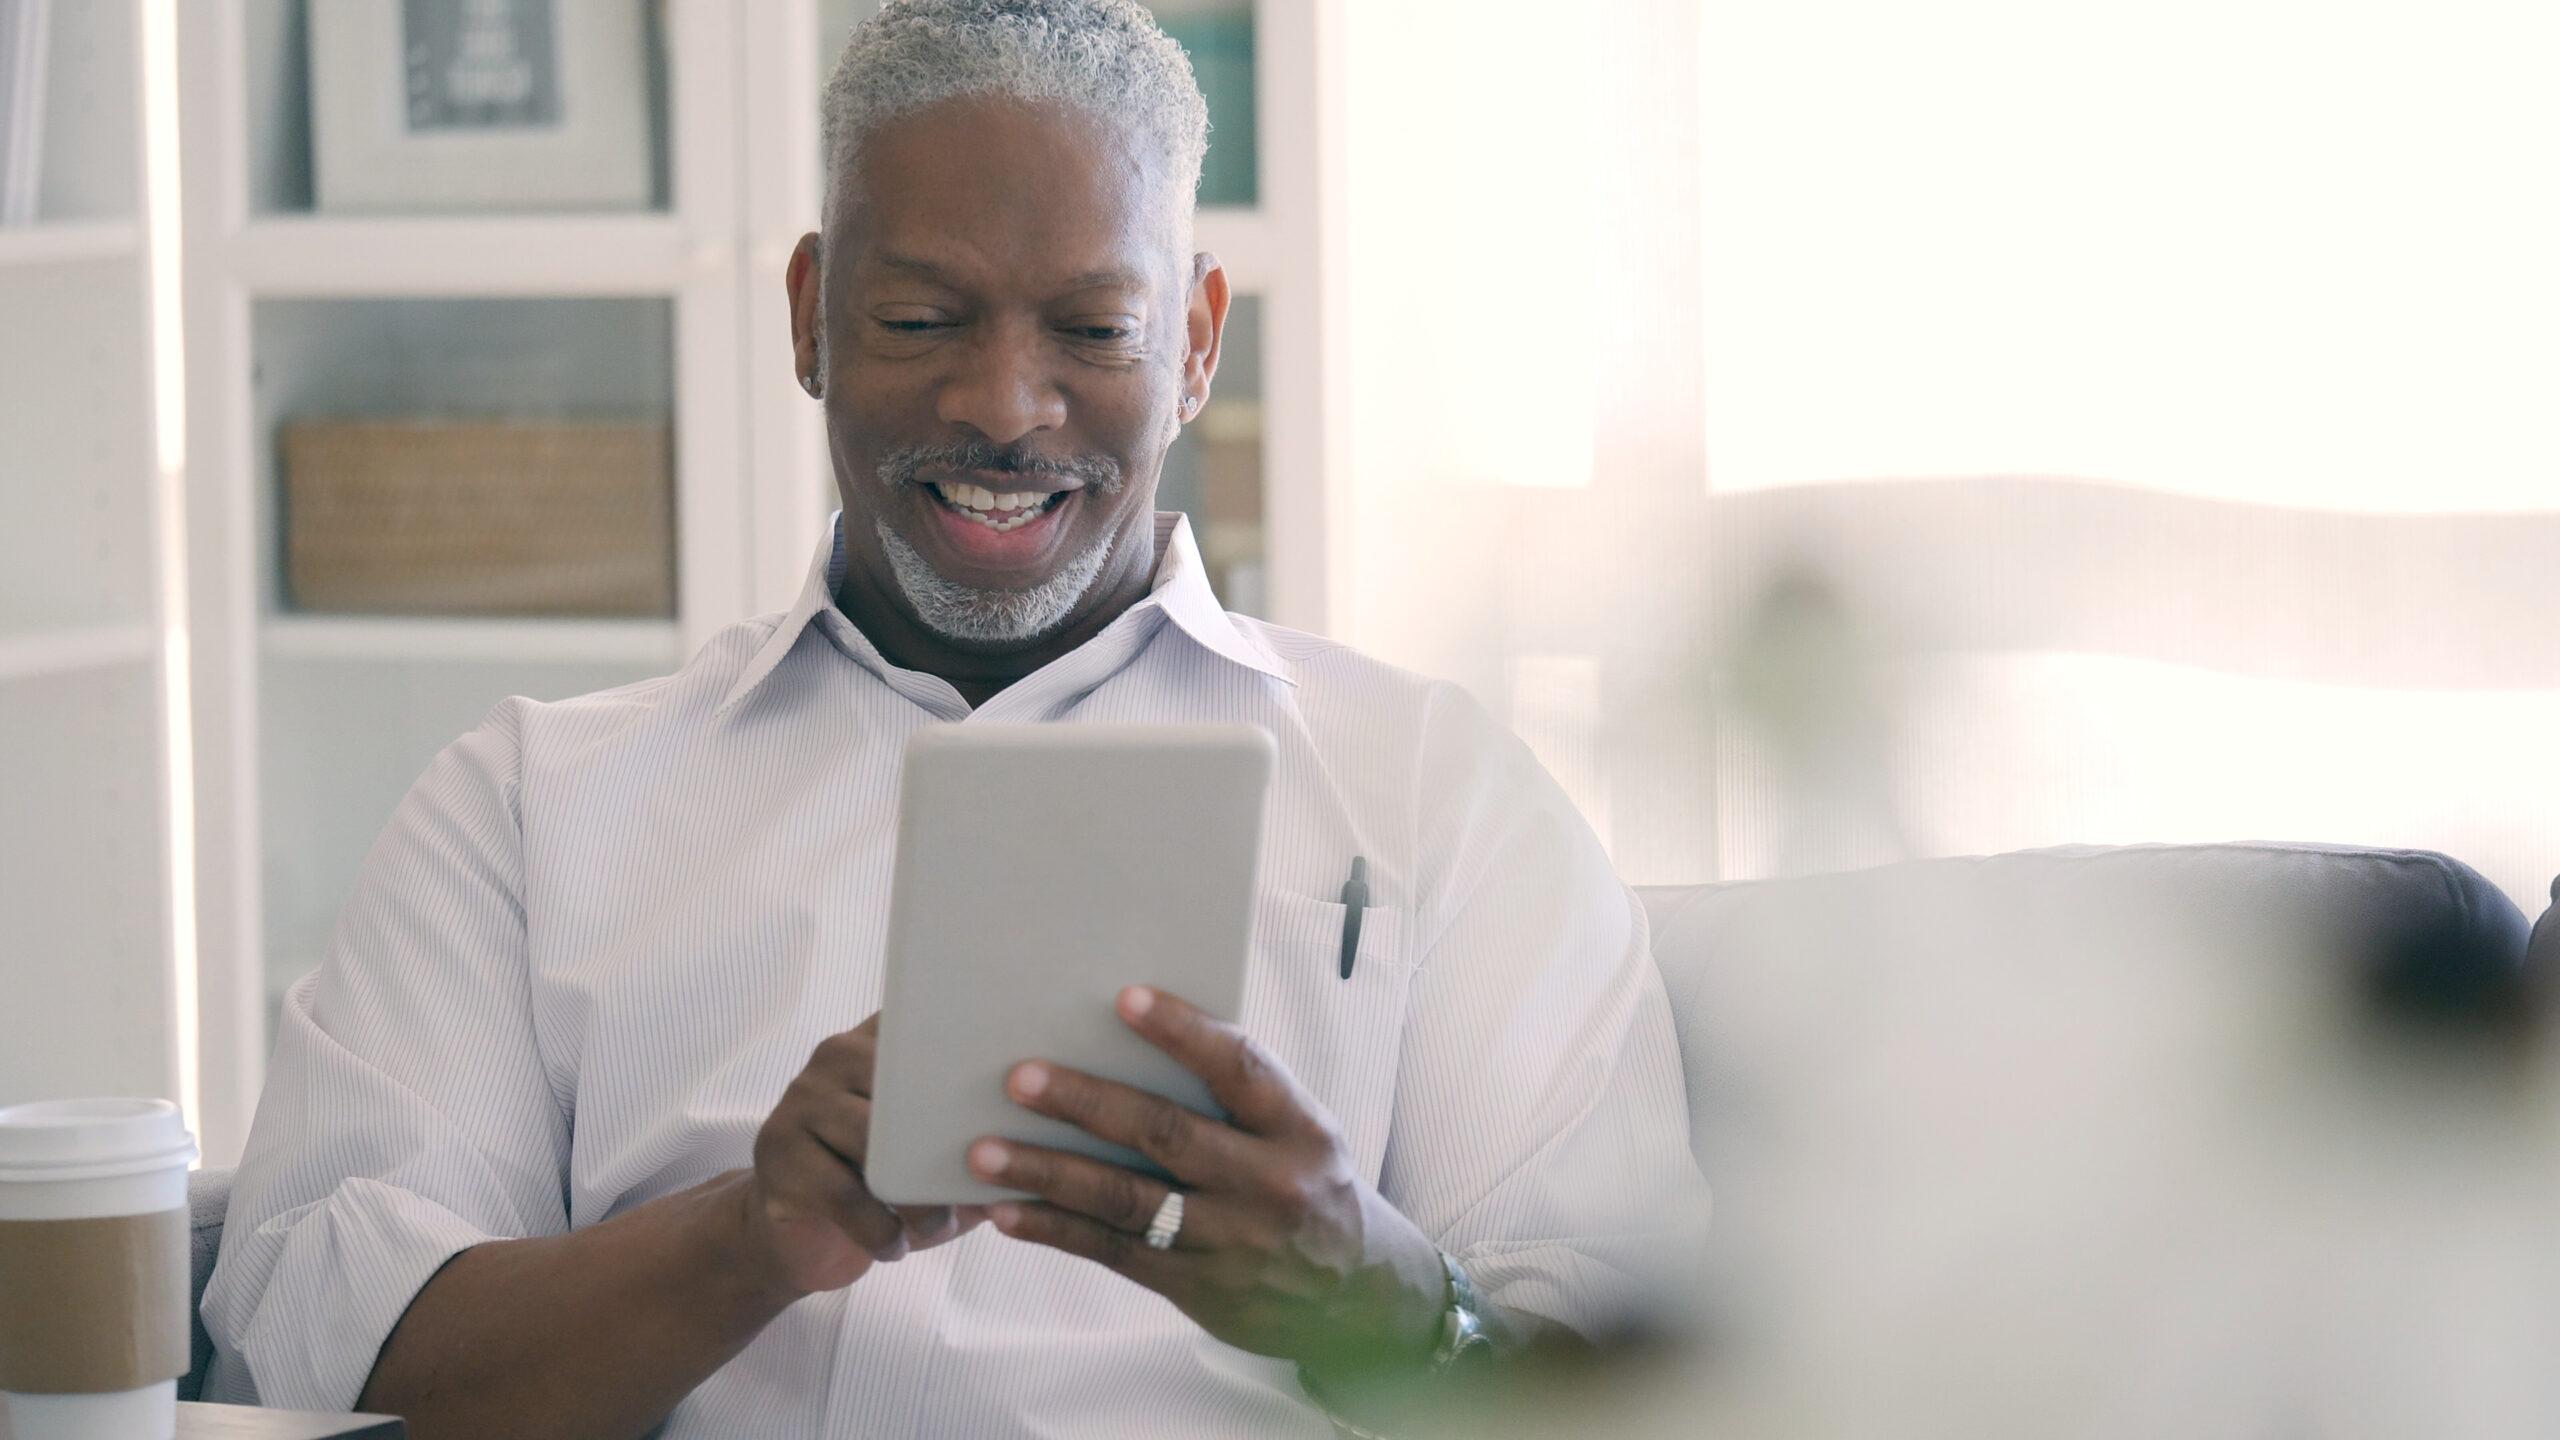 Male using digital tablet